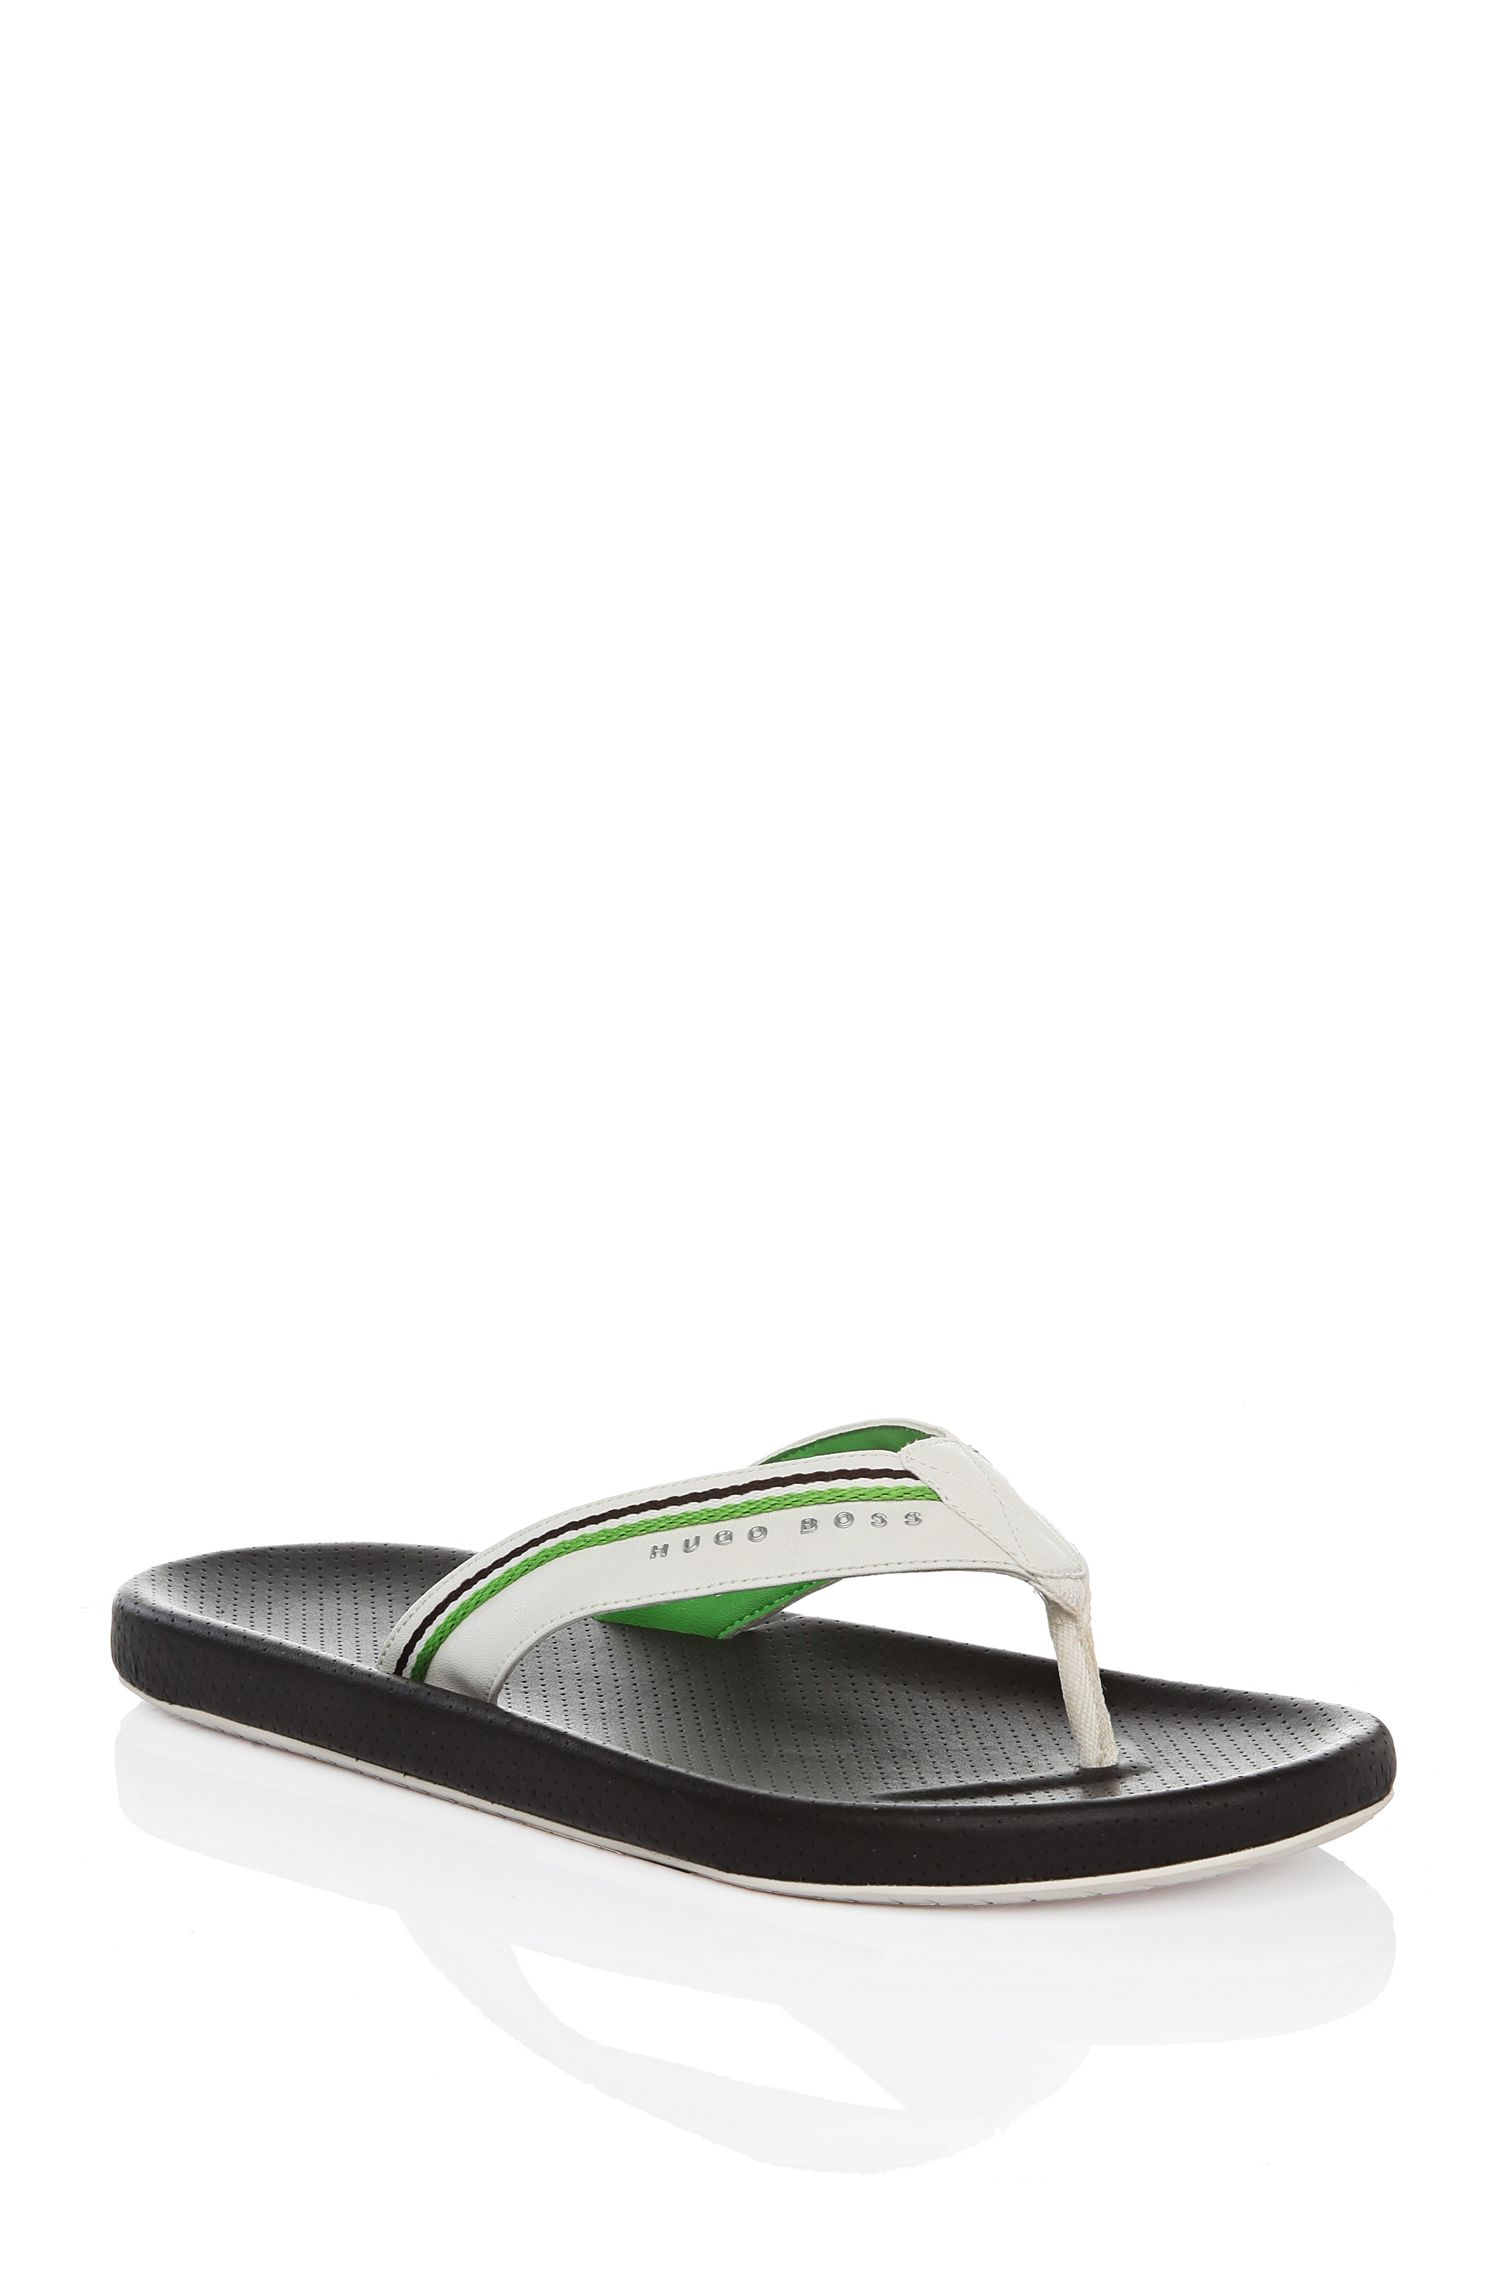 Textile Thong Sandal | Shoreline Fresh